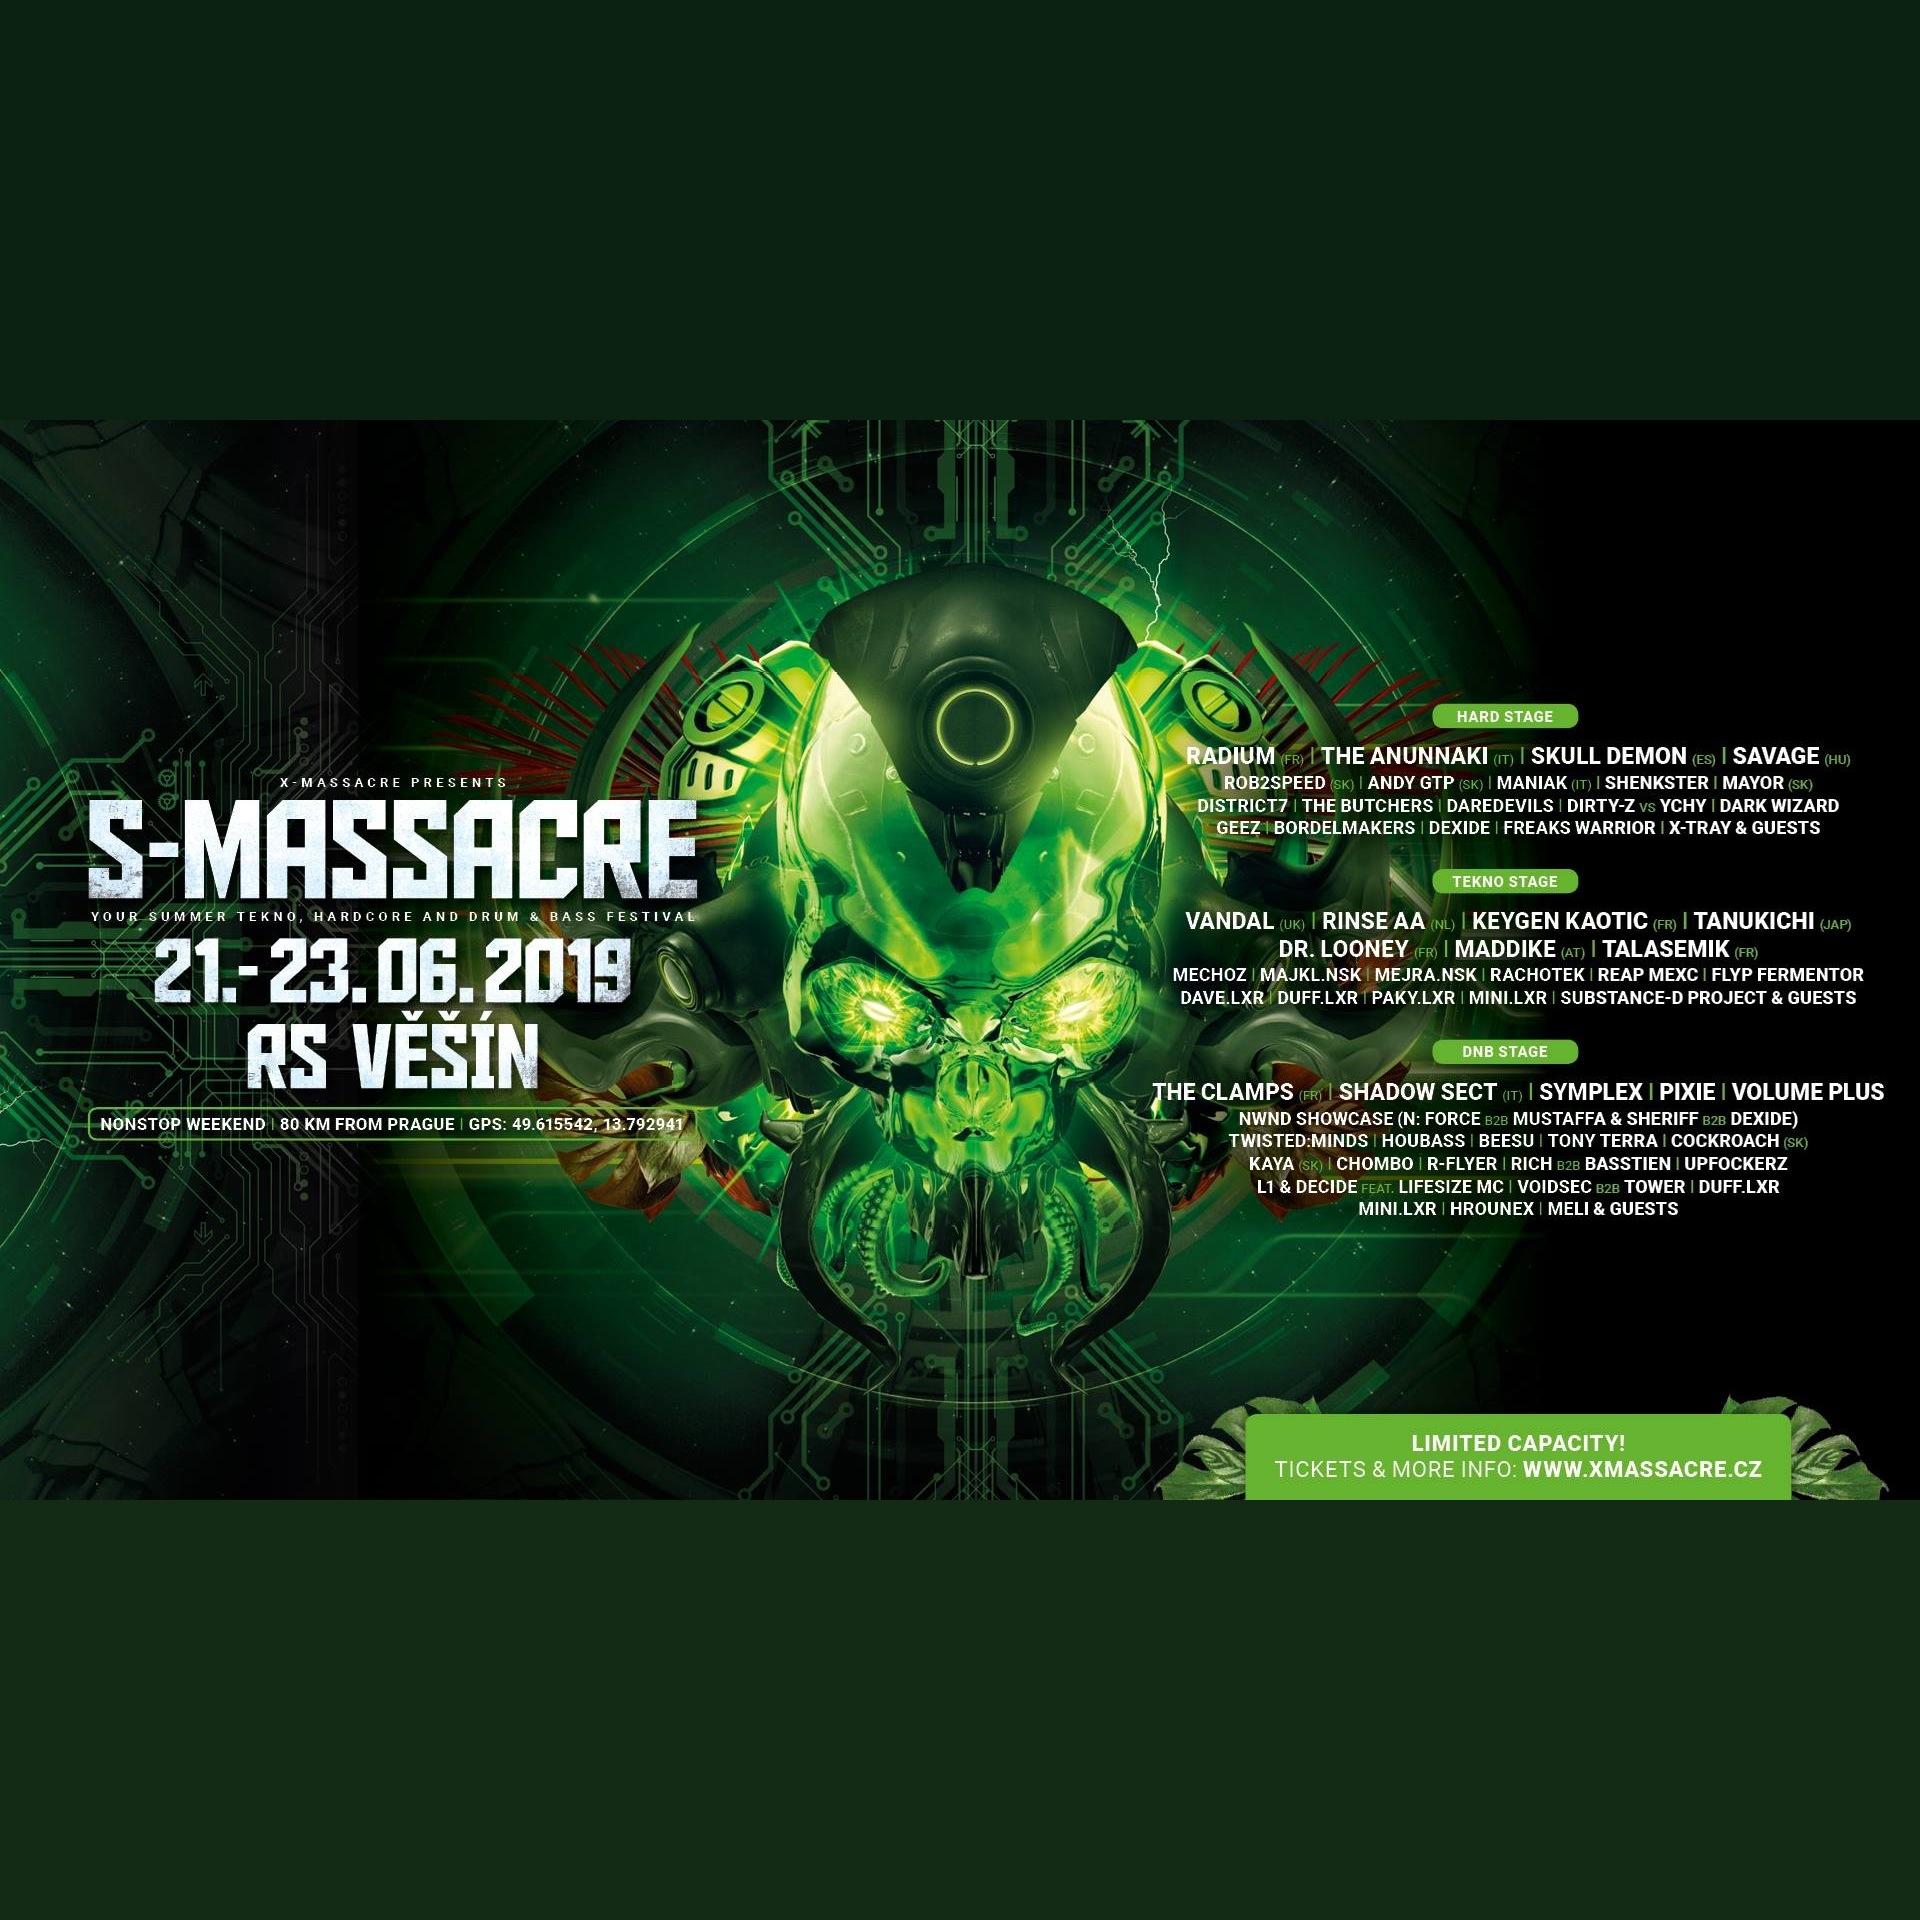 S-Massacre 2019 - Tickets, line-up & info